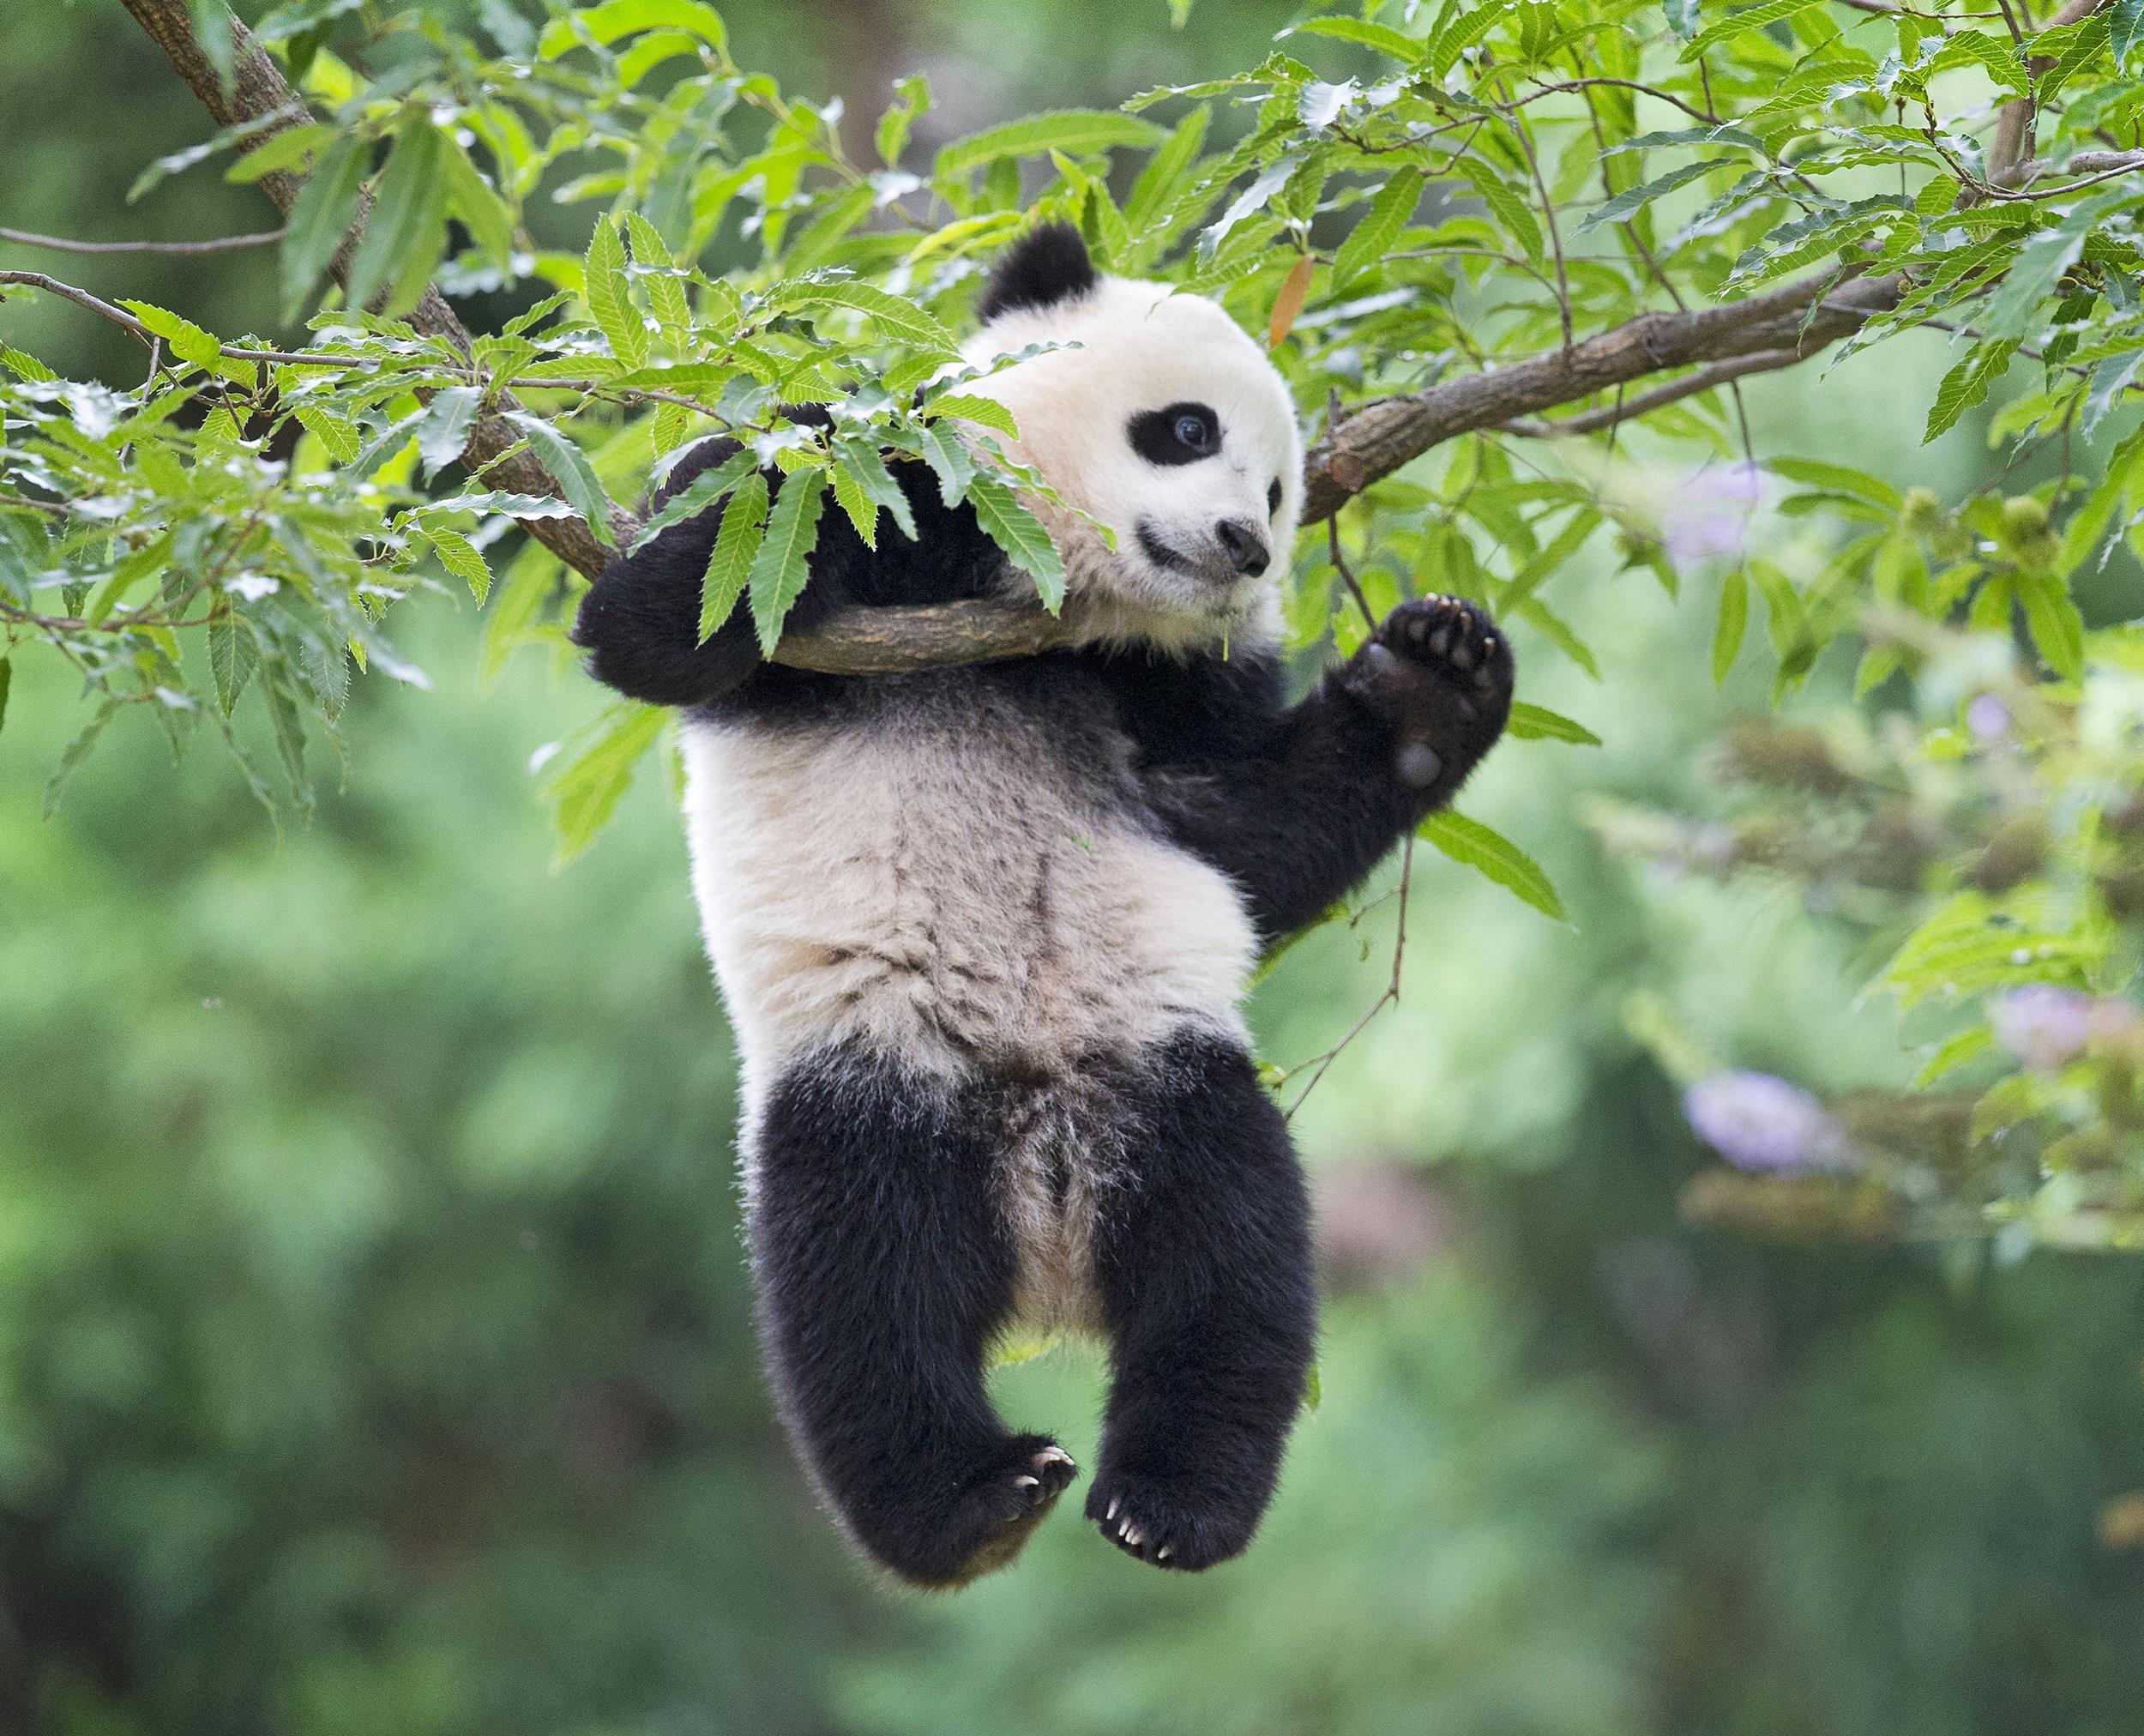 Americas Favorite Giant Panda Celebrates First Birthday